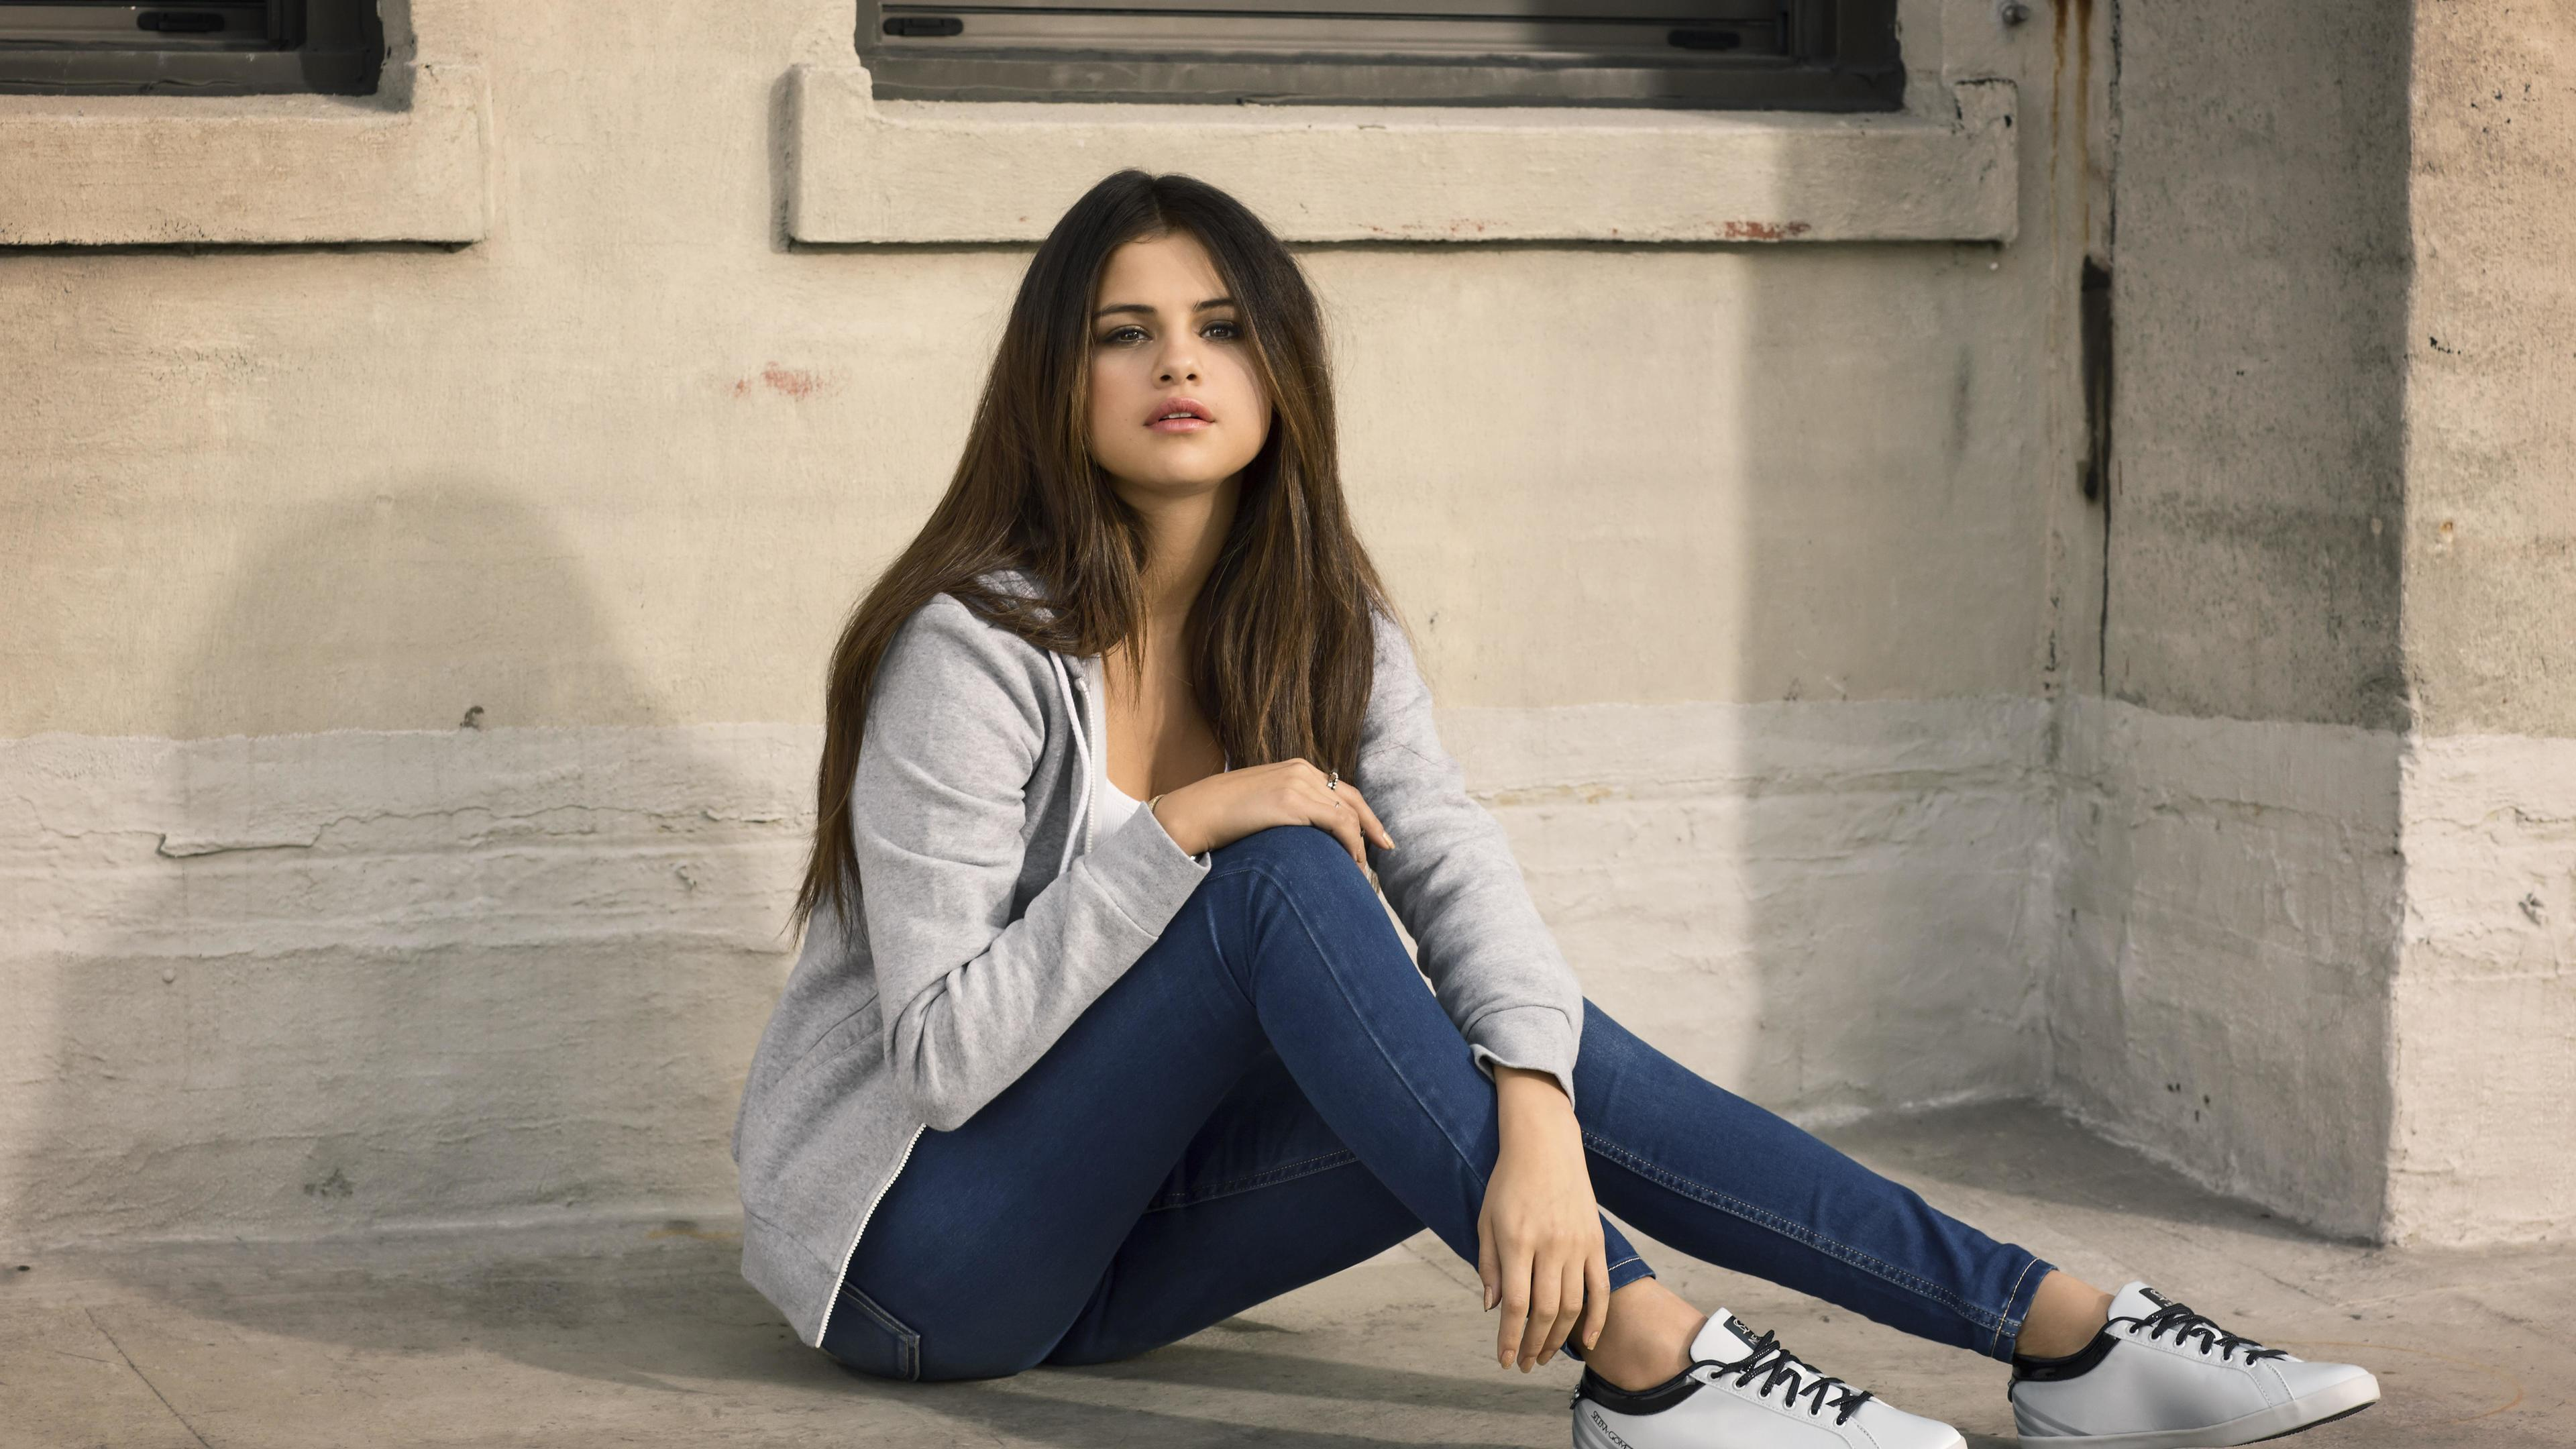 selena gomez 8k 1536863240 - Selena Gomez 8k - selena gomez wallpapers, music wallpapers, hd-wallpapers, girls wallpapers, celebrities wallpapers, 8k wallpapers, 5k wallpapers, 4k-wallpapers